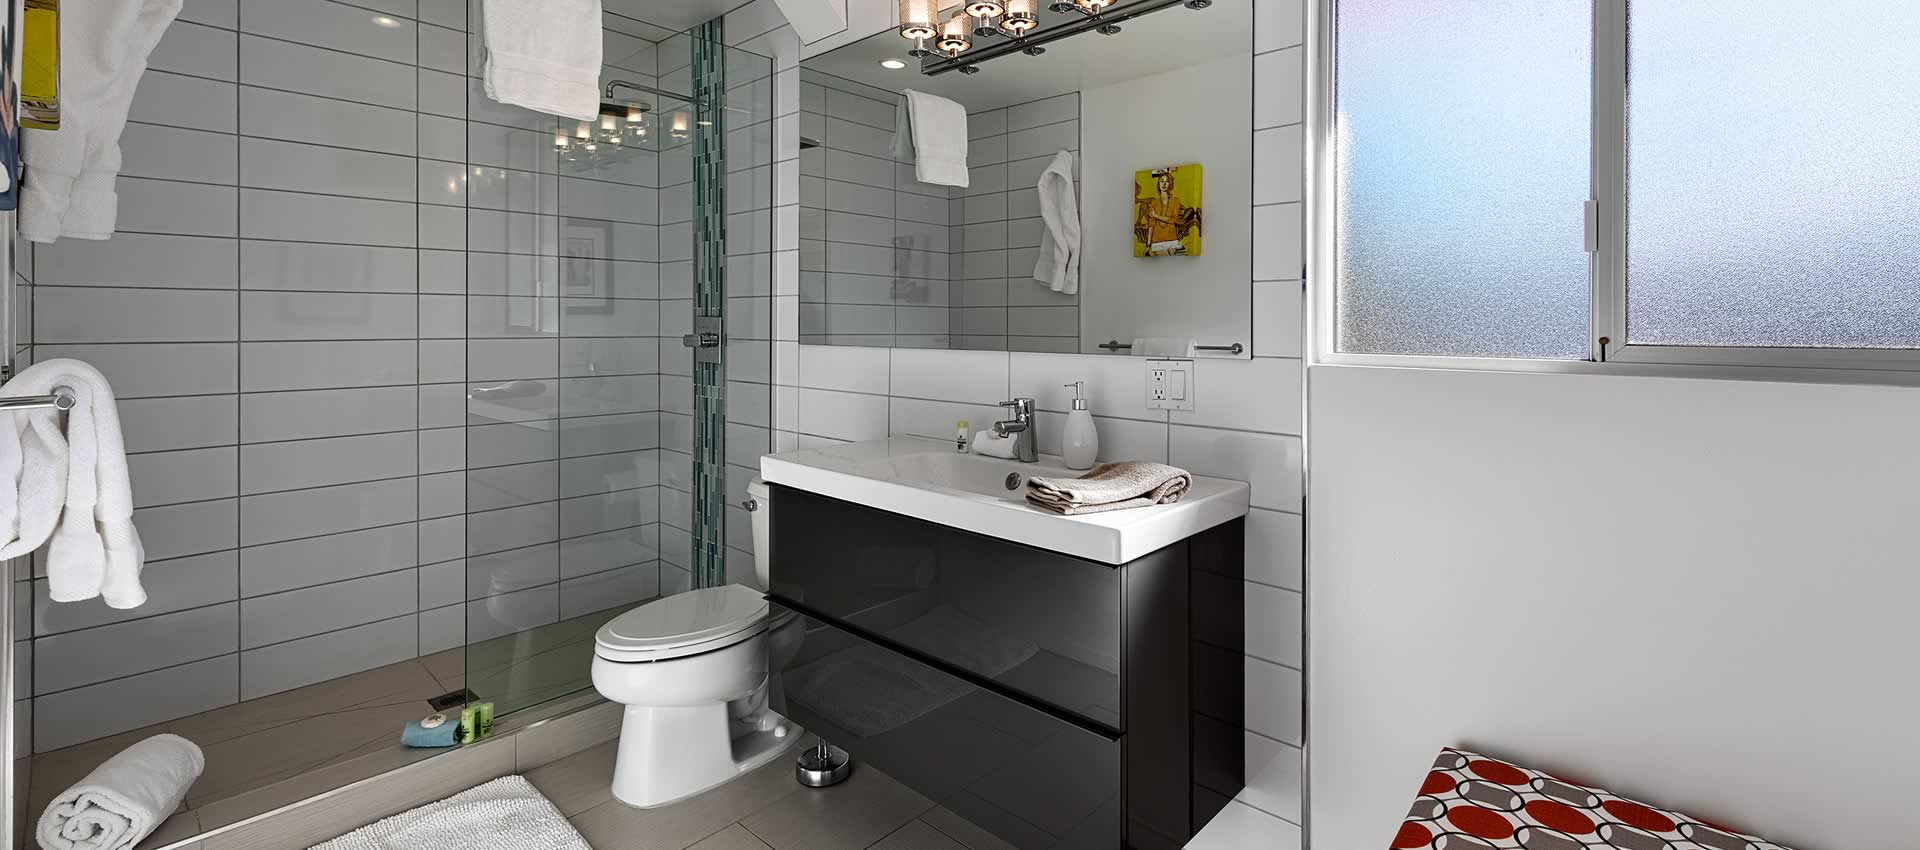 twist-hotel-room219-bath